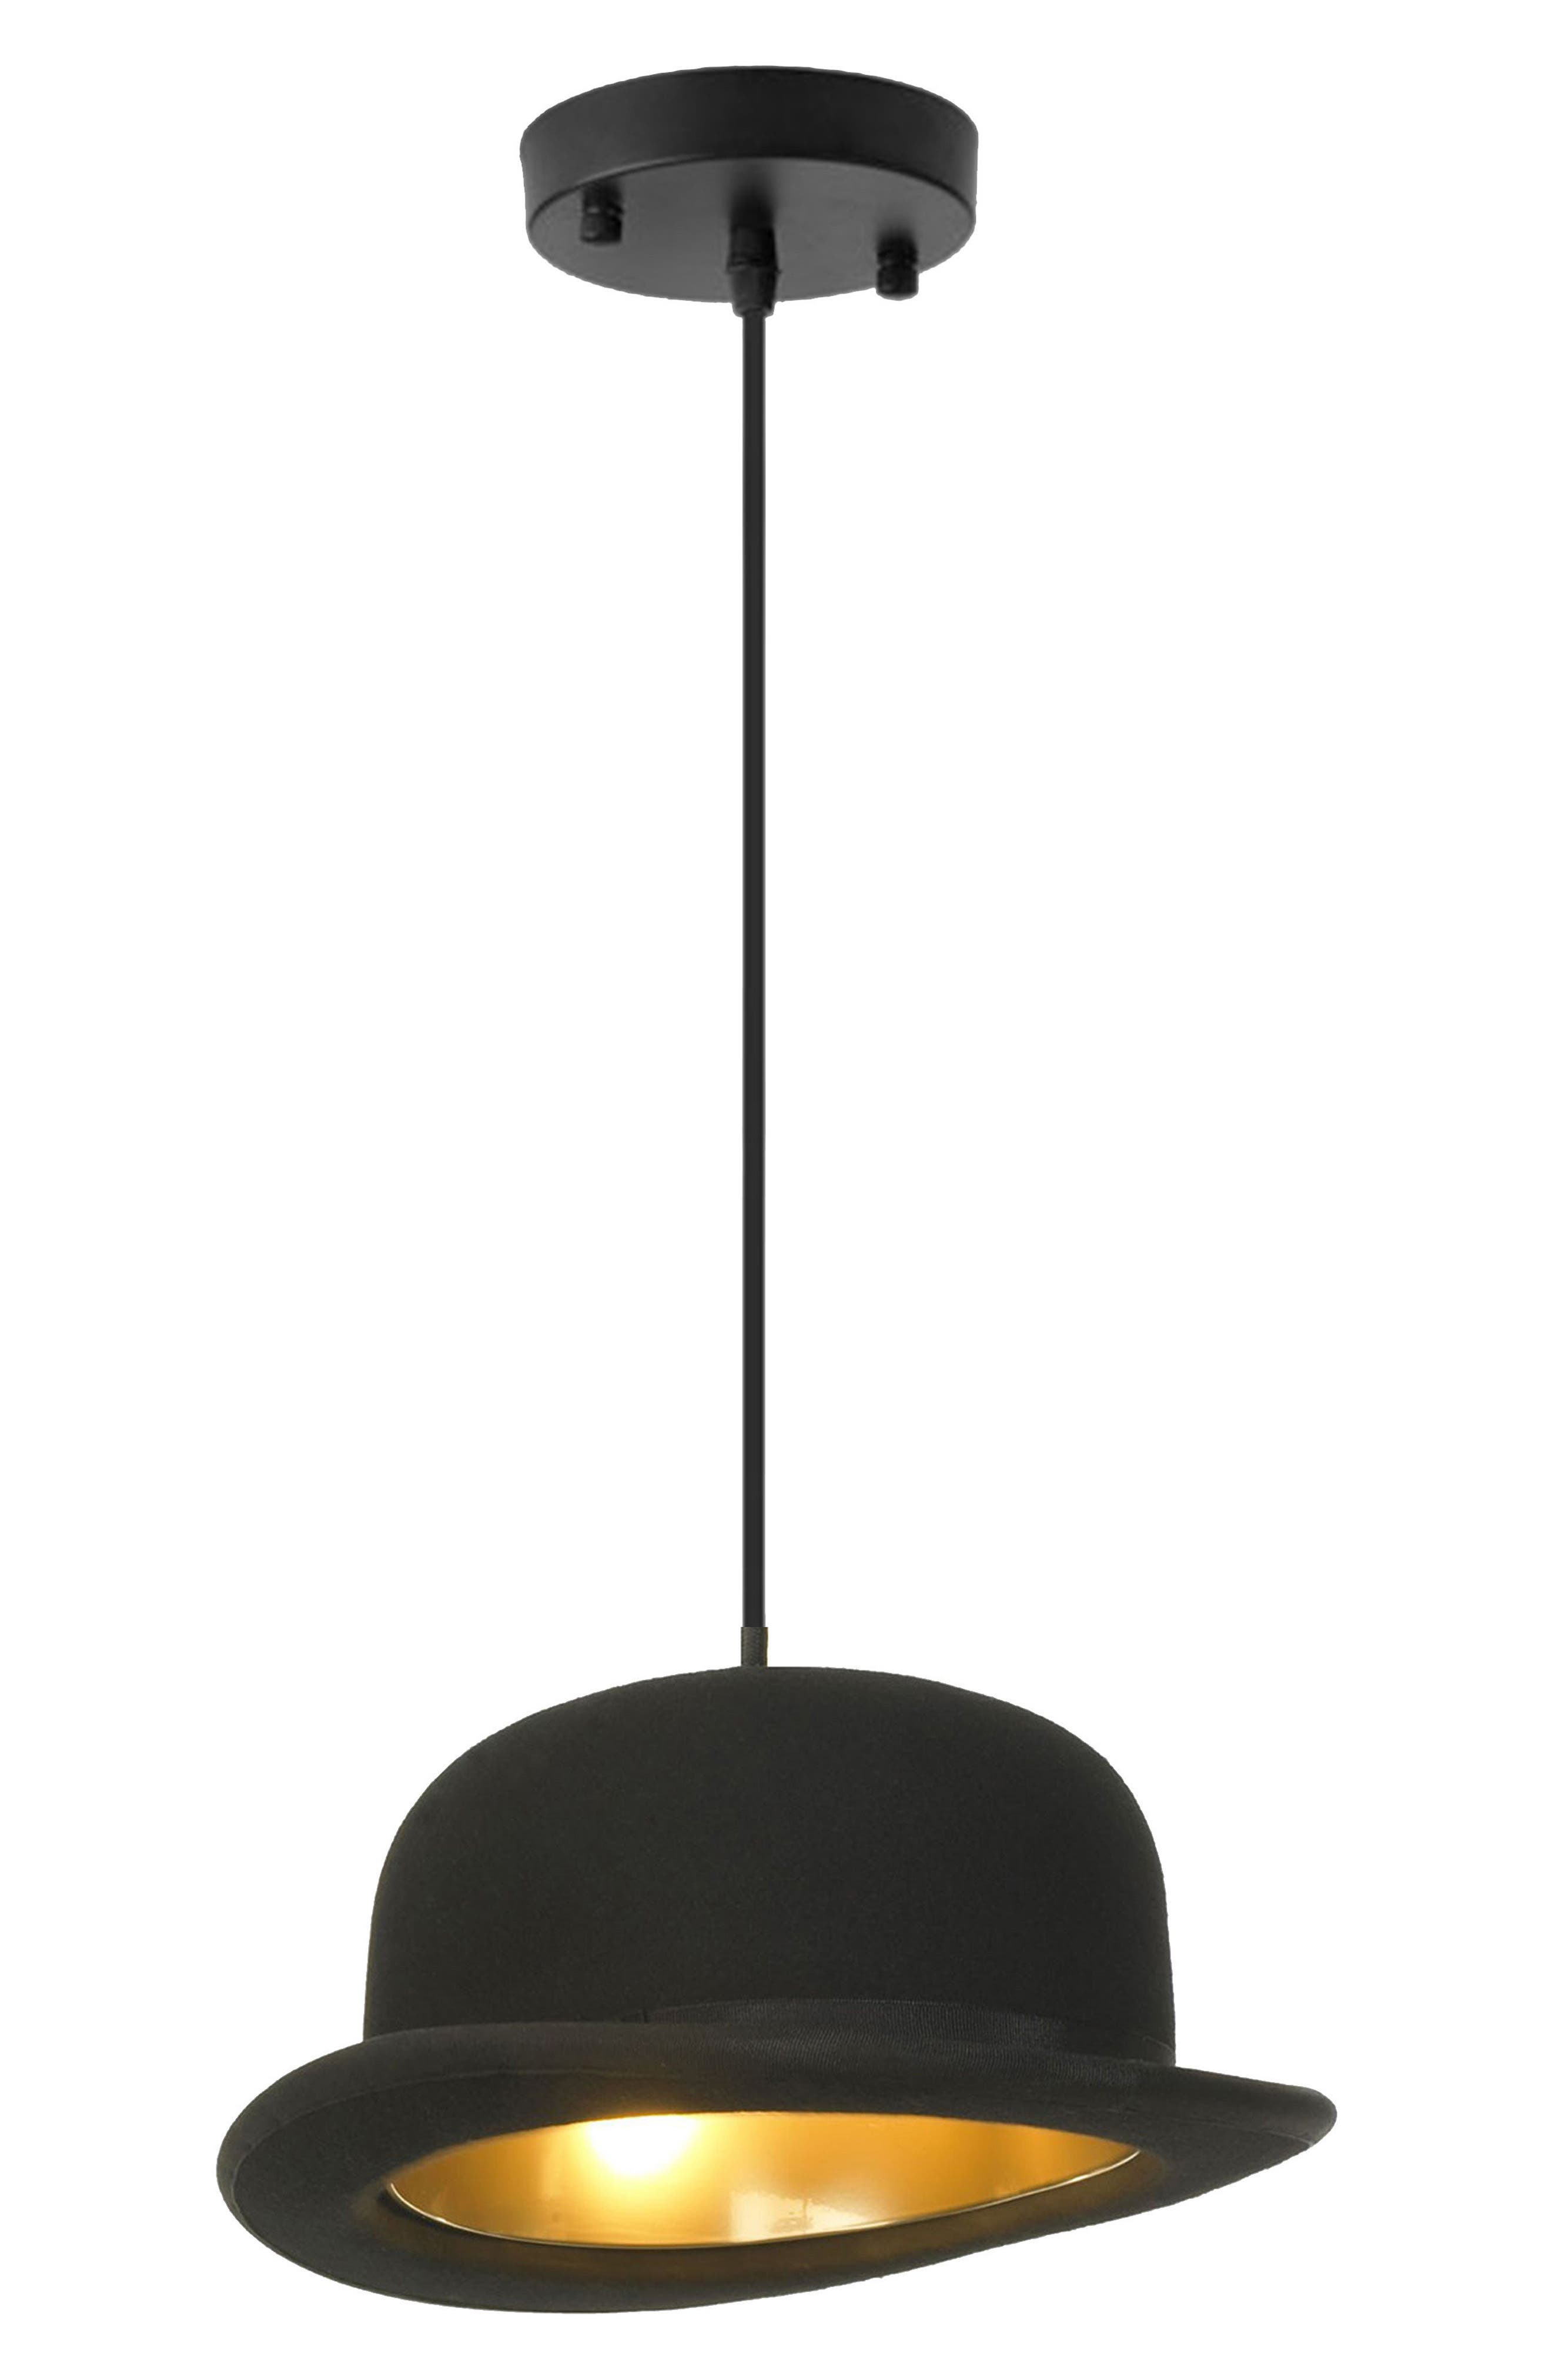 Main Image - Renwil Blaxton Bowler Hat Ceiling Fixture